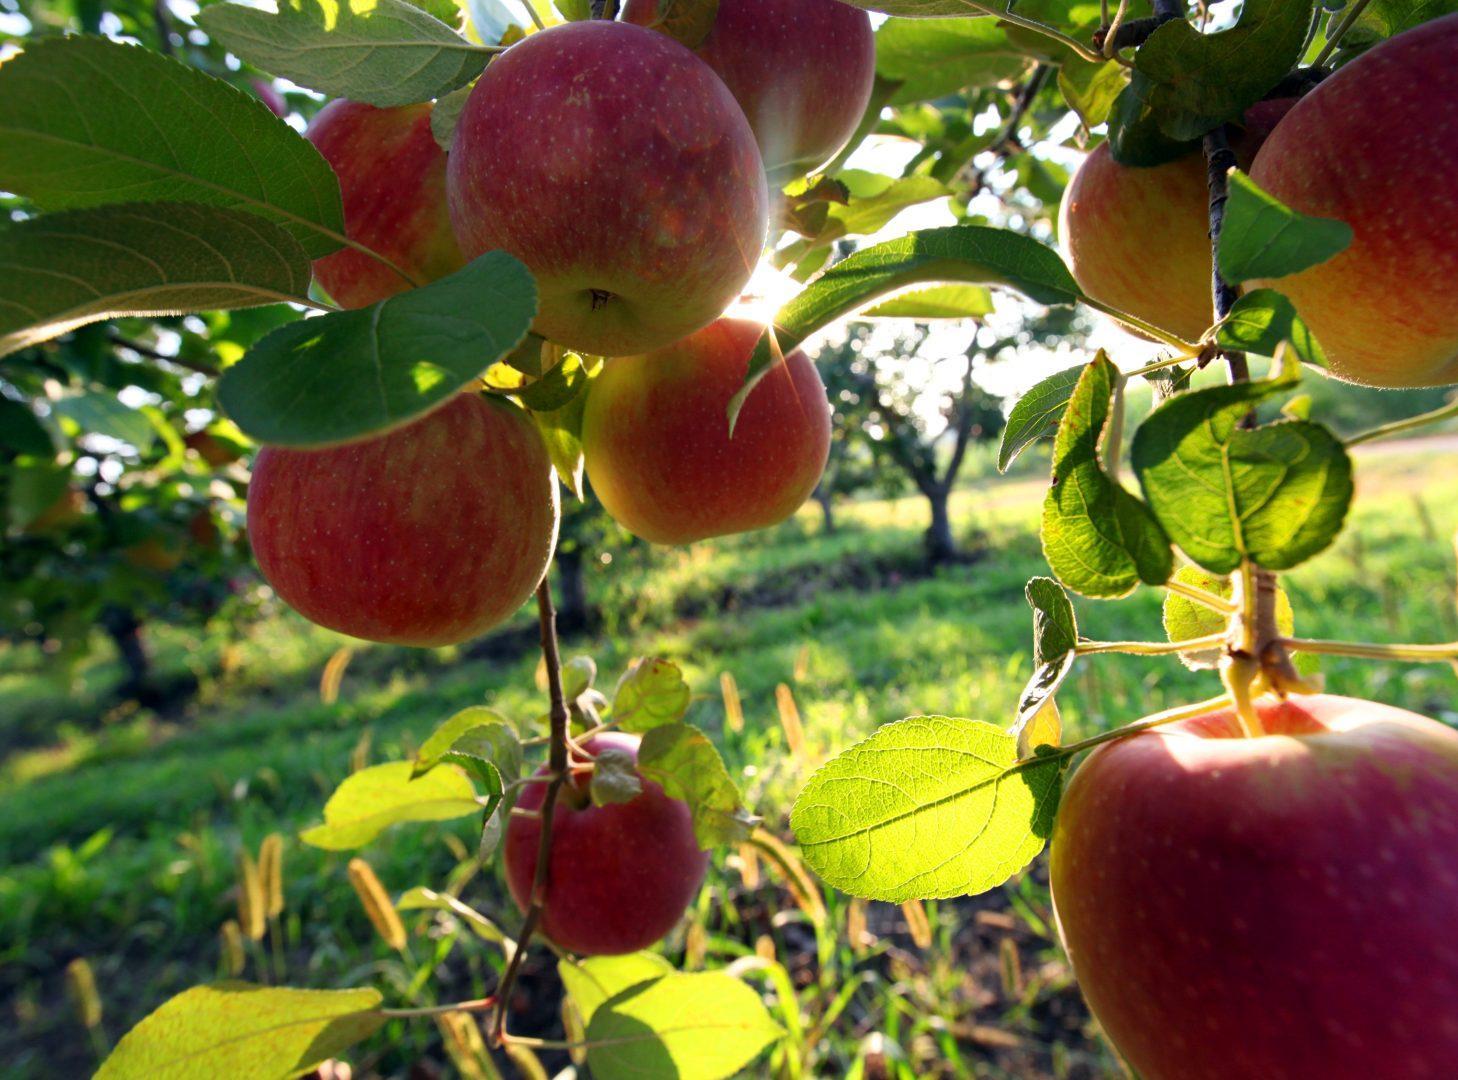 The Comma Interrobang: The Big Apple